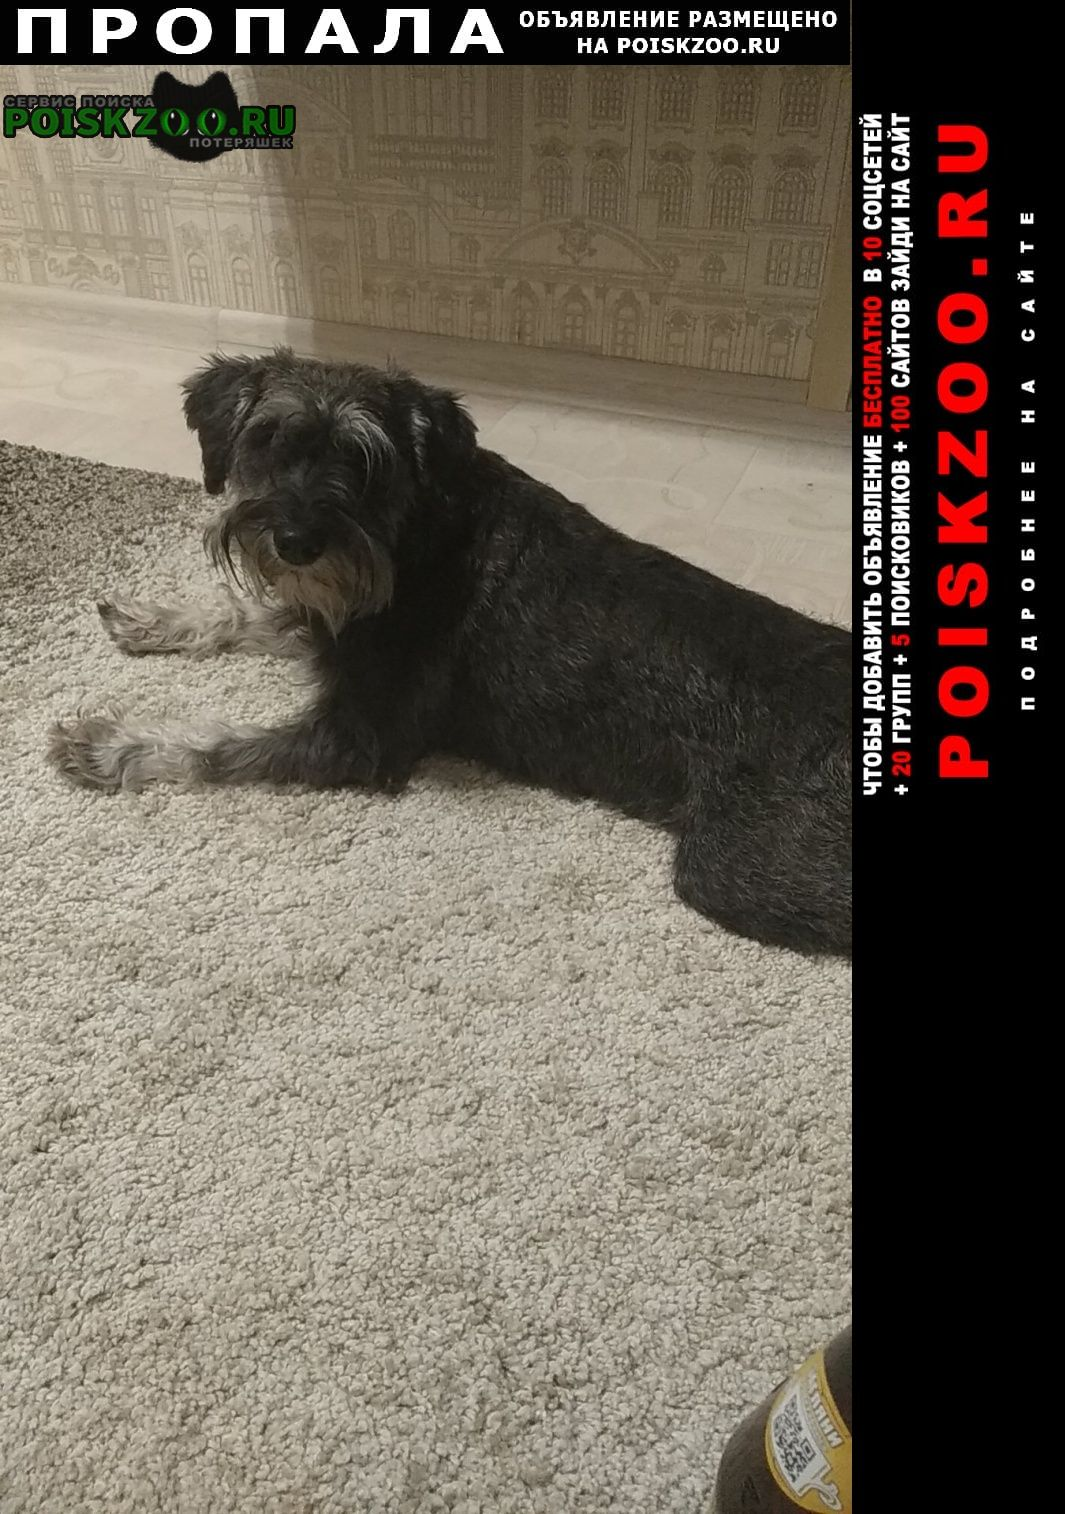 Пропала собака цвергшнауцер Люберцы